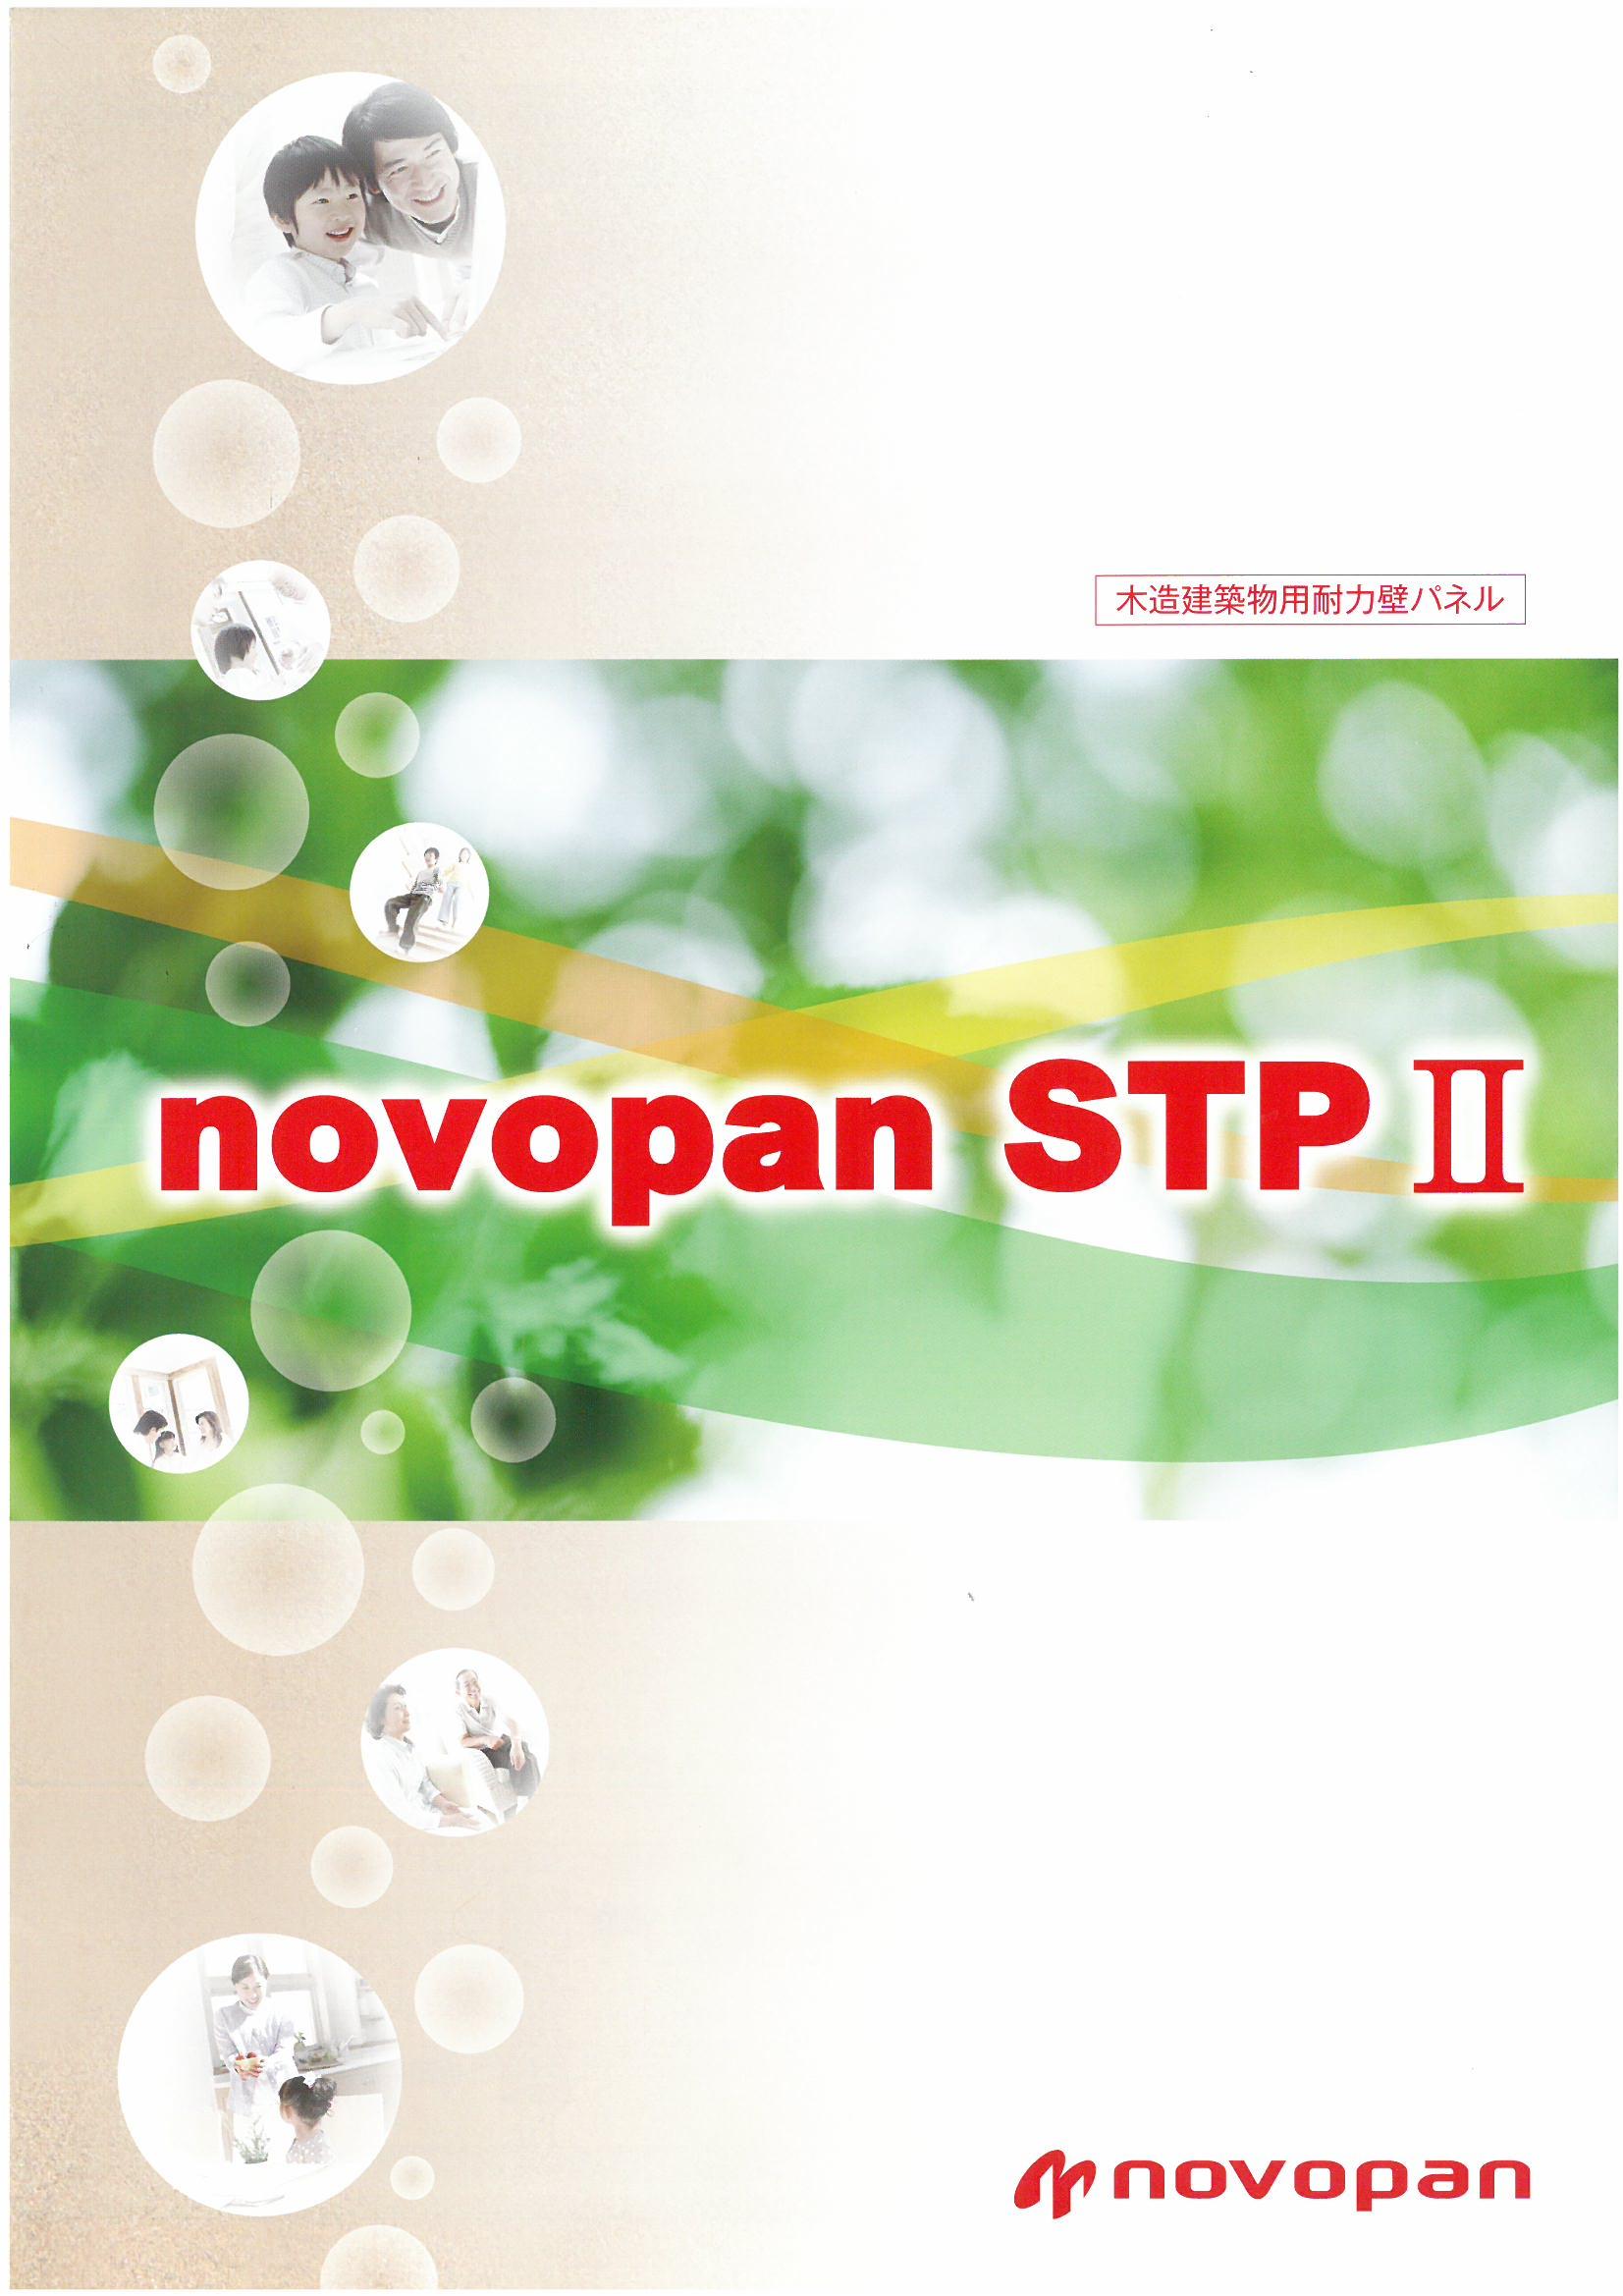 novopan STPⅡ パンフレット